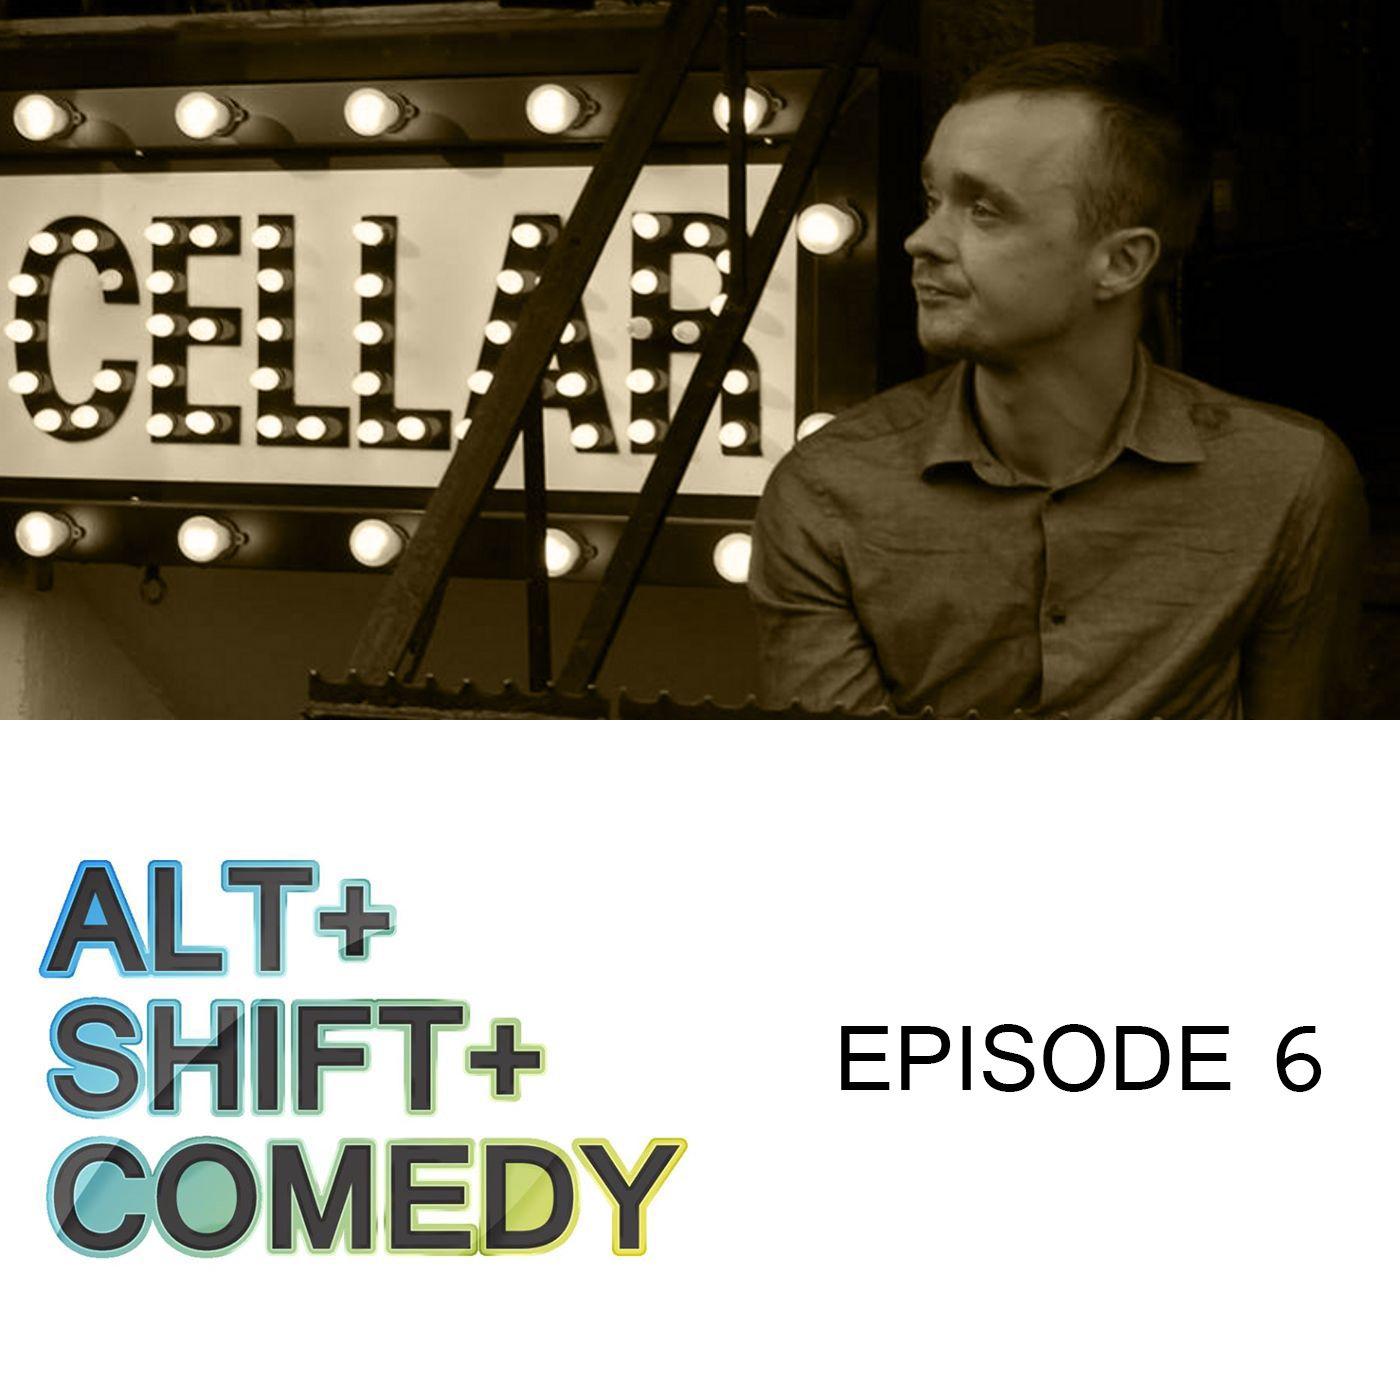 Alt Shift Comedy